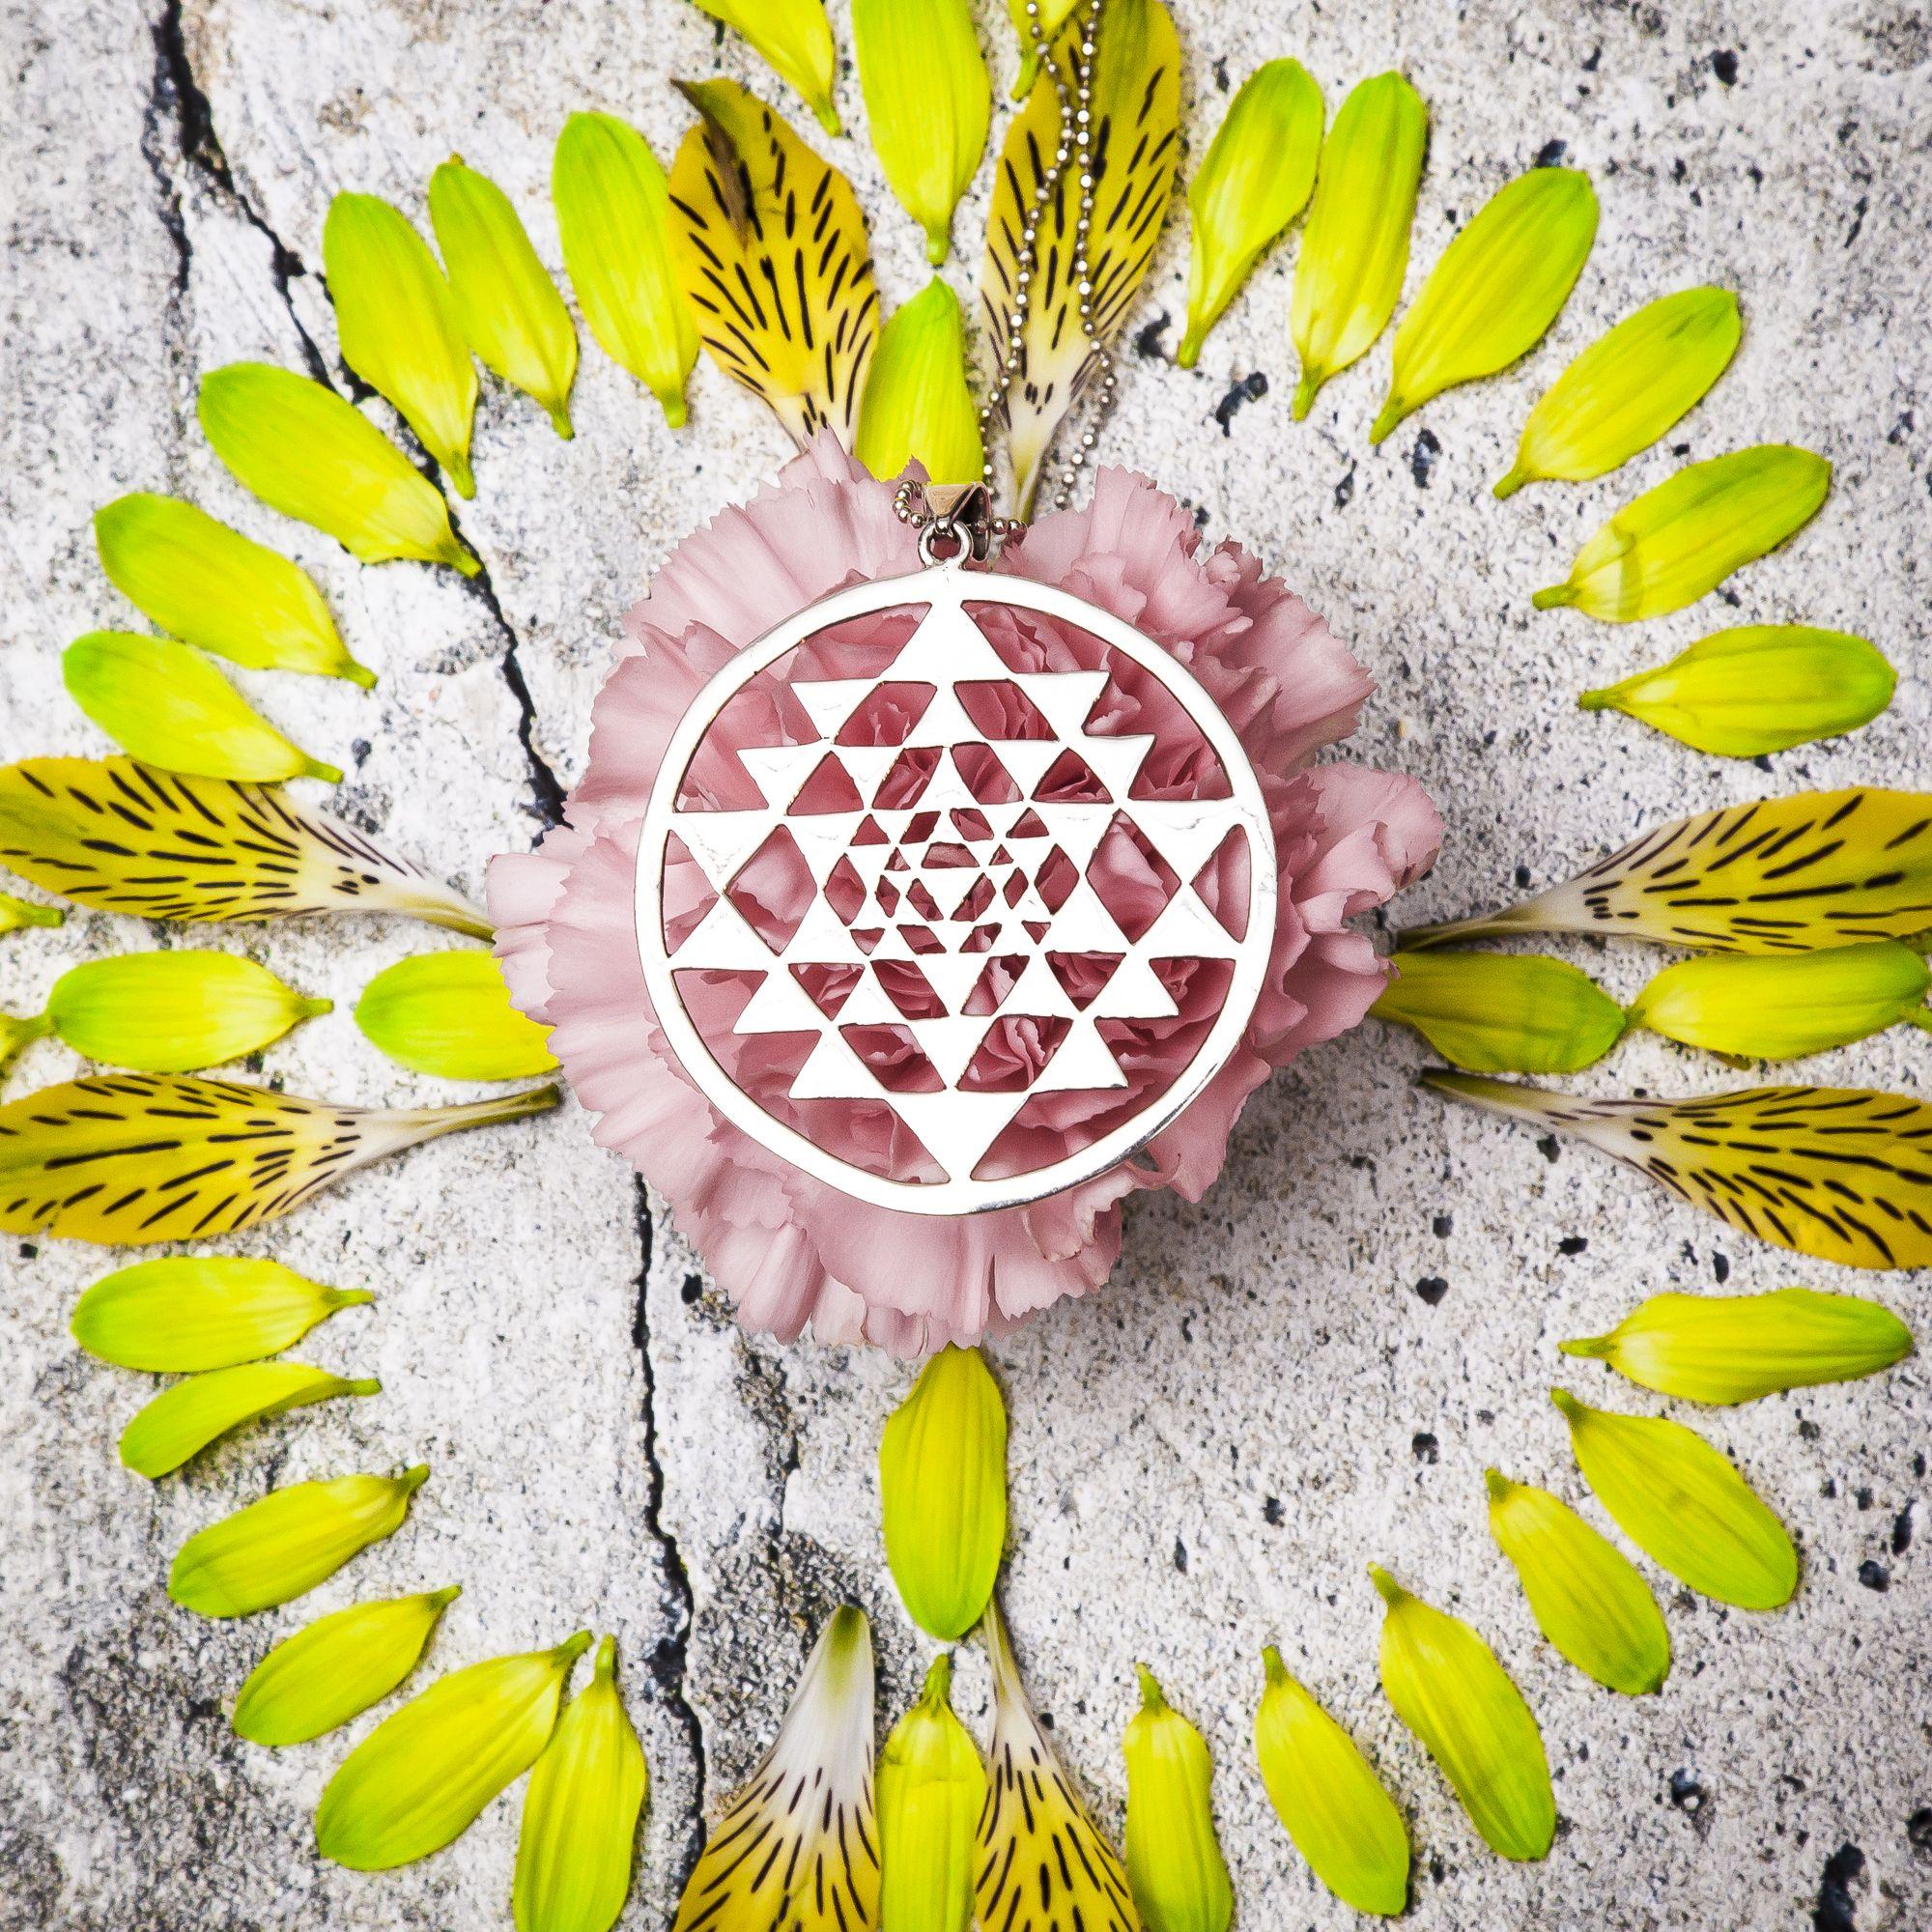 Sri Yantra Pendant  #om #sriyantra #yogic #accessories #namaste   http://saraswatimoon.myshopify.com/search?q=sri+yantra+&search-button.x=0&search-button.y=0